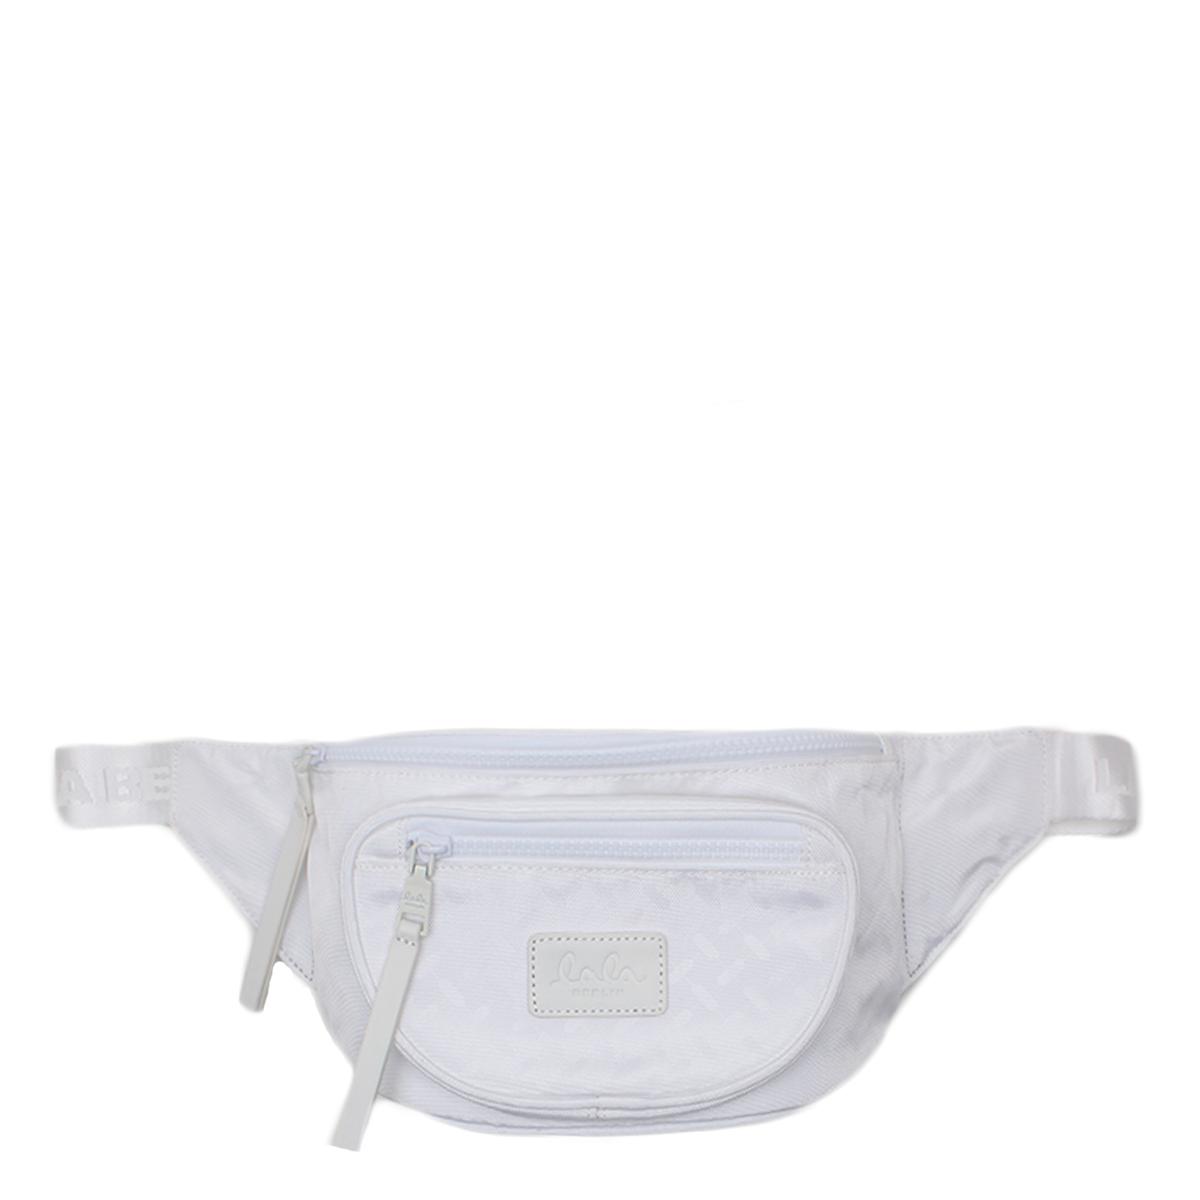 LALA BERLIN TASKE - SMALL BELT BAG CLOE CLASSIC WHITE